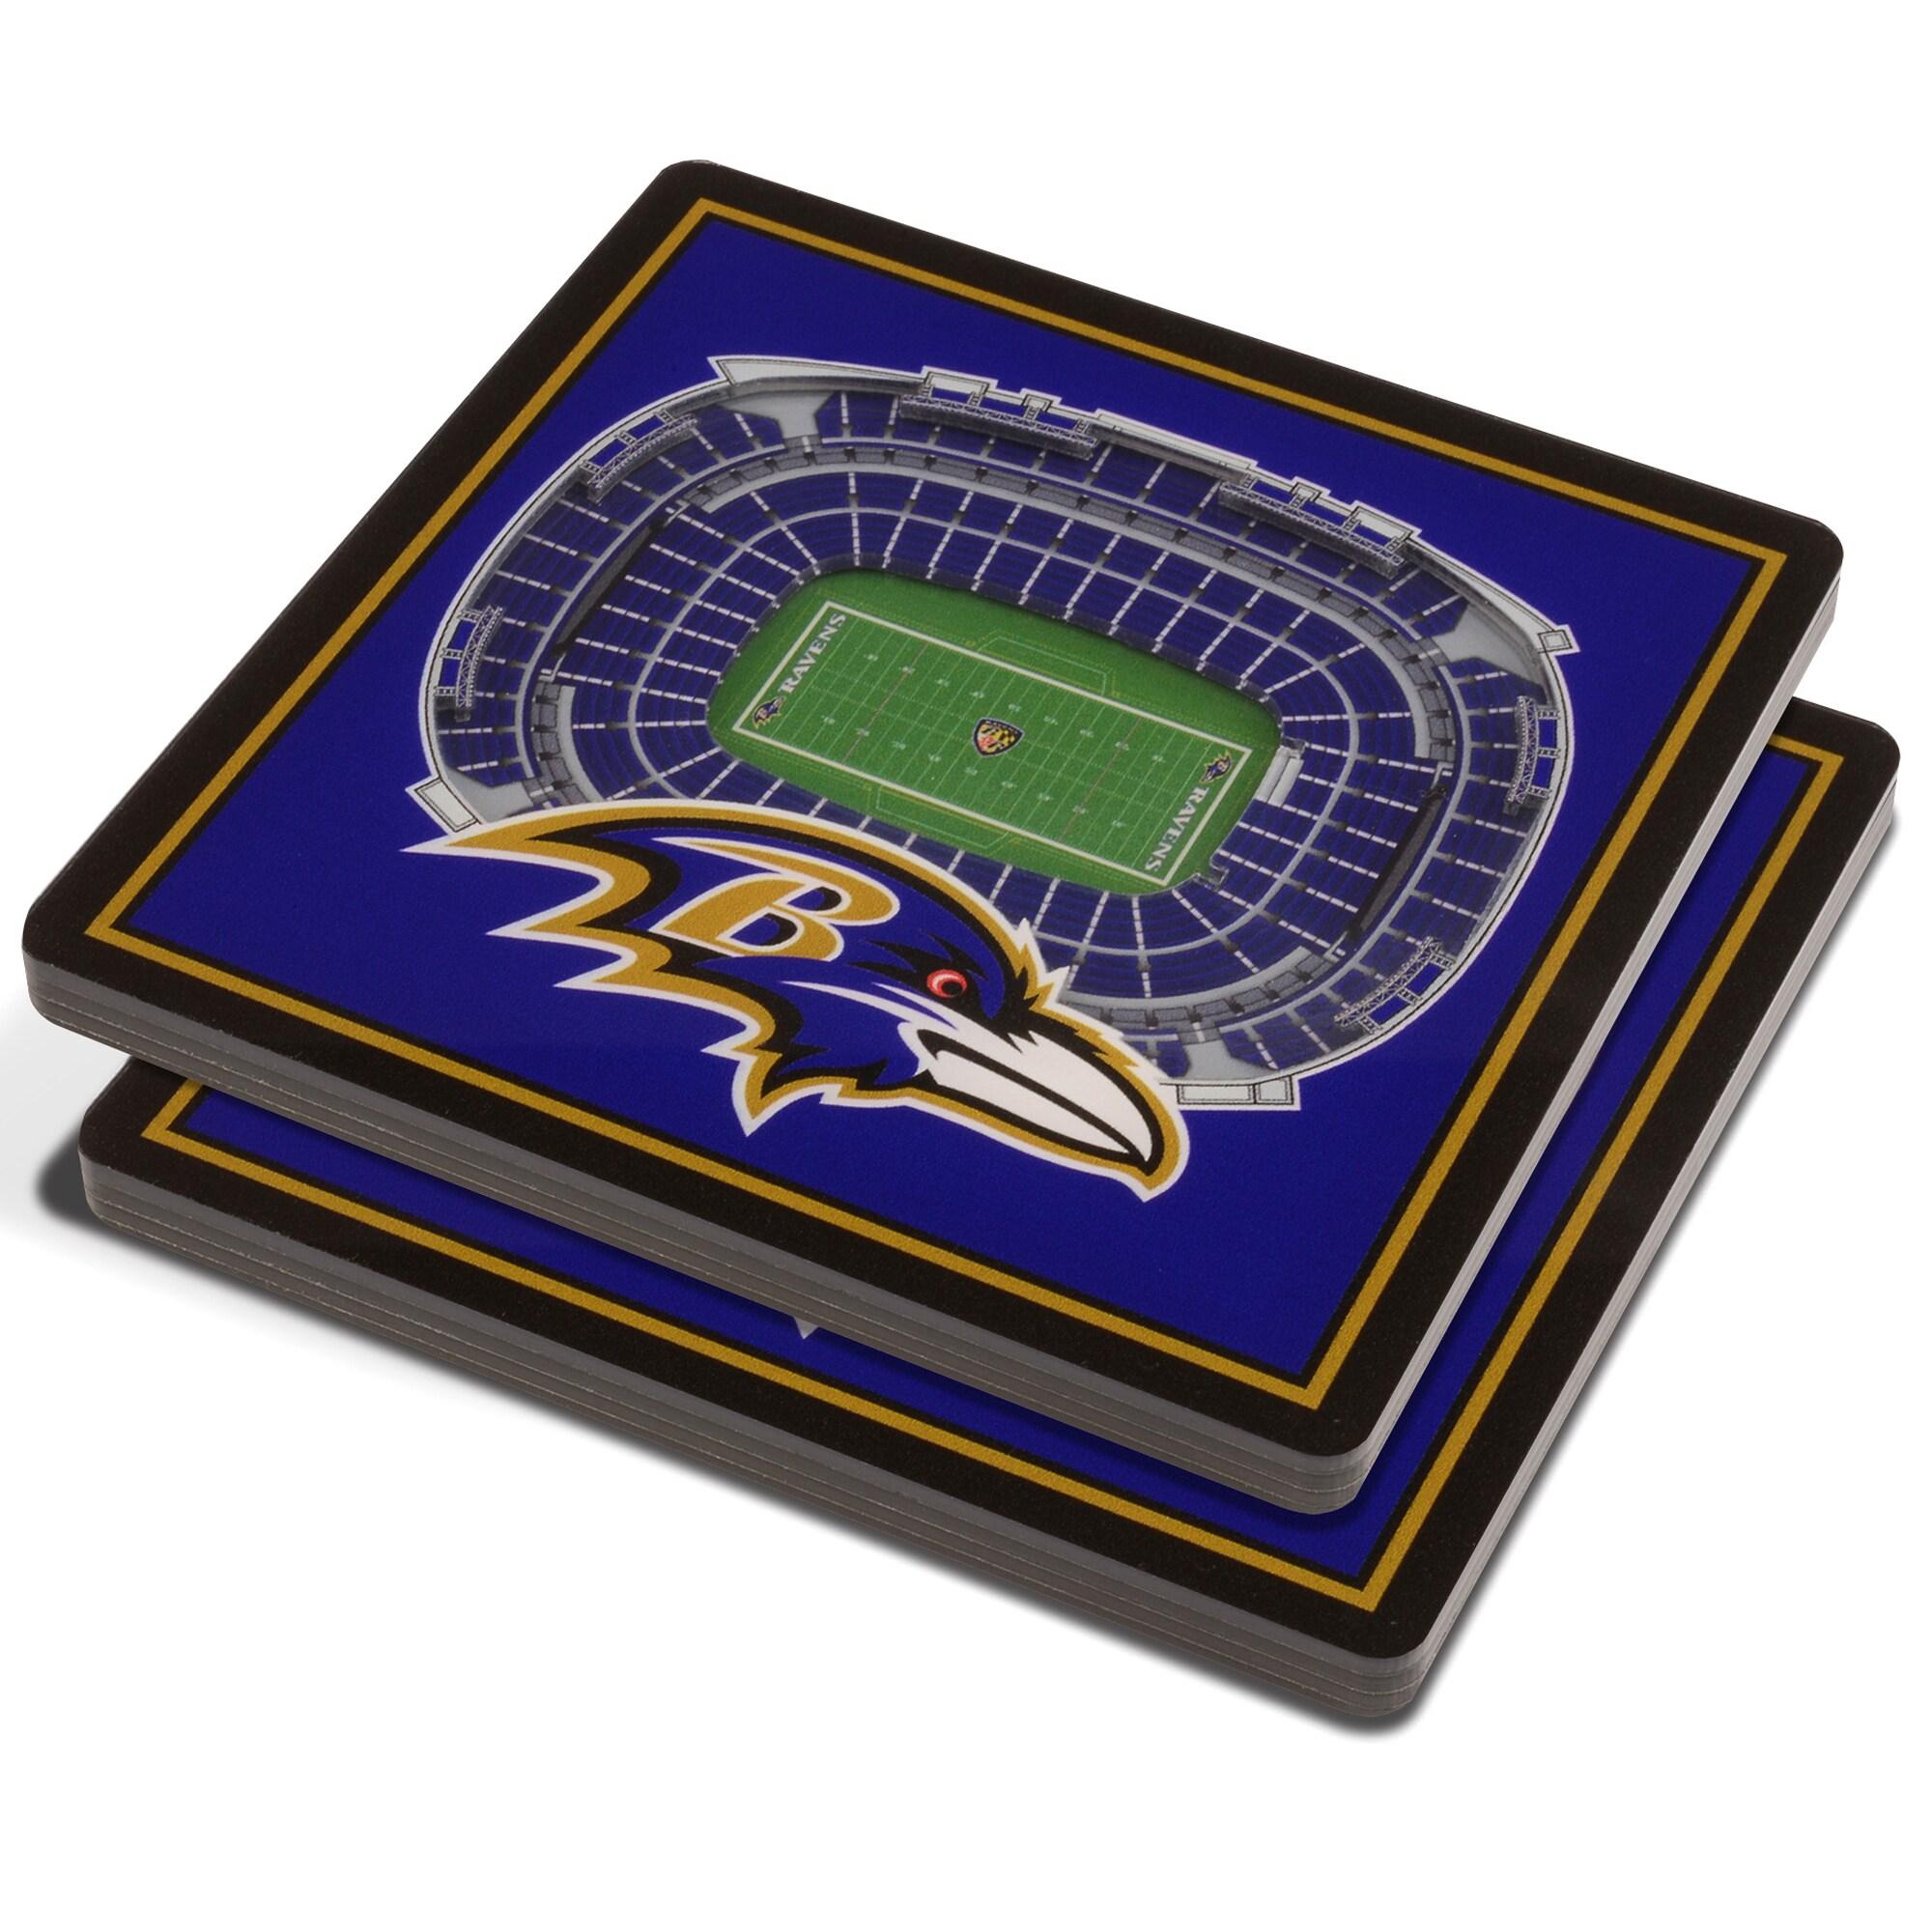 Baltimore Ravens 3D StadiumViews Coasters - Purple